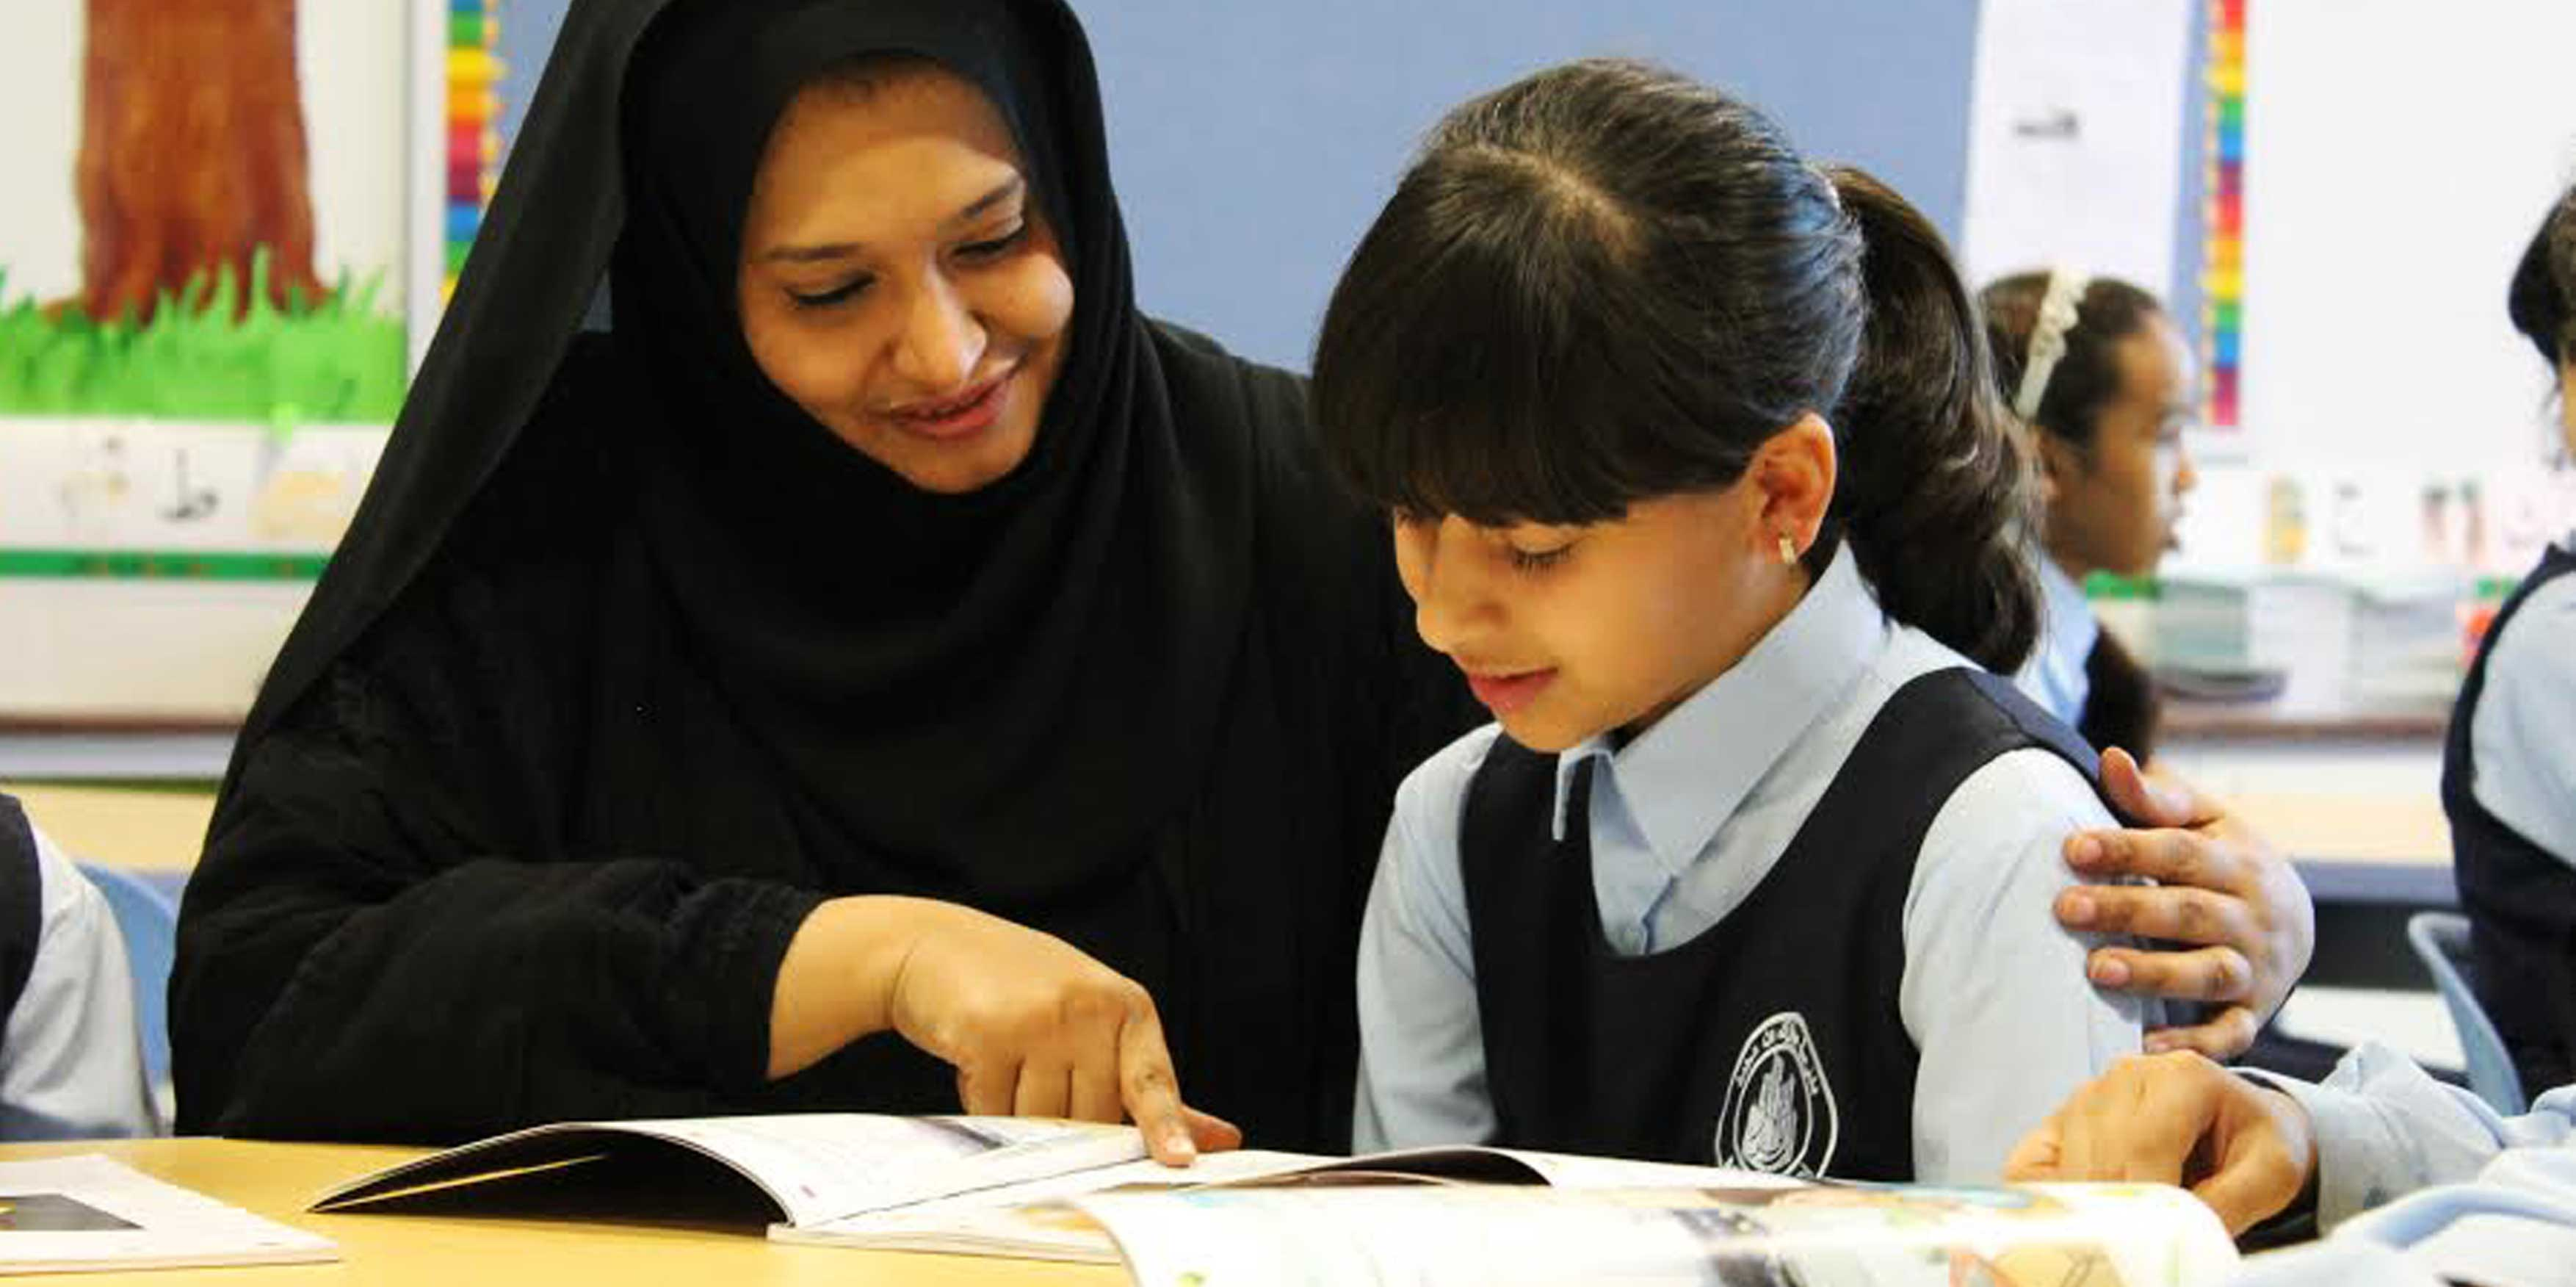 UAE announces new education policy for schools, teachers - Bhatkallys.com